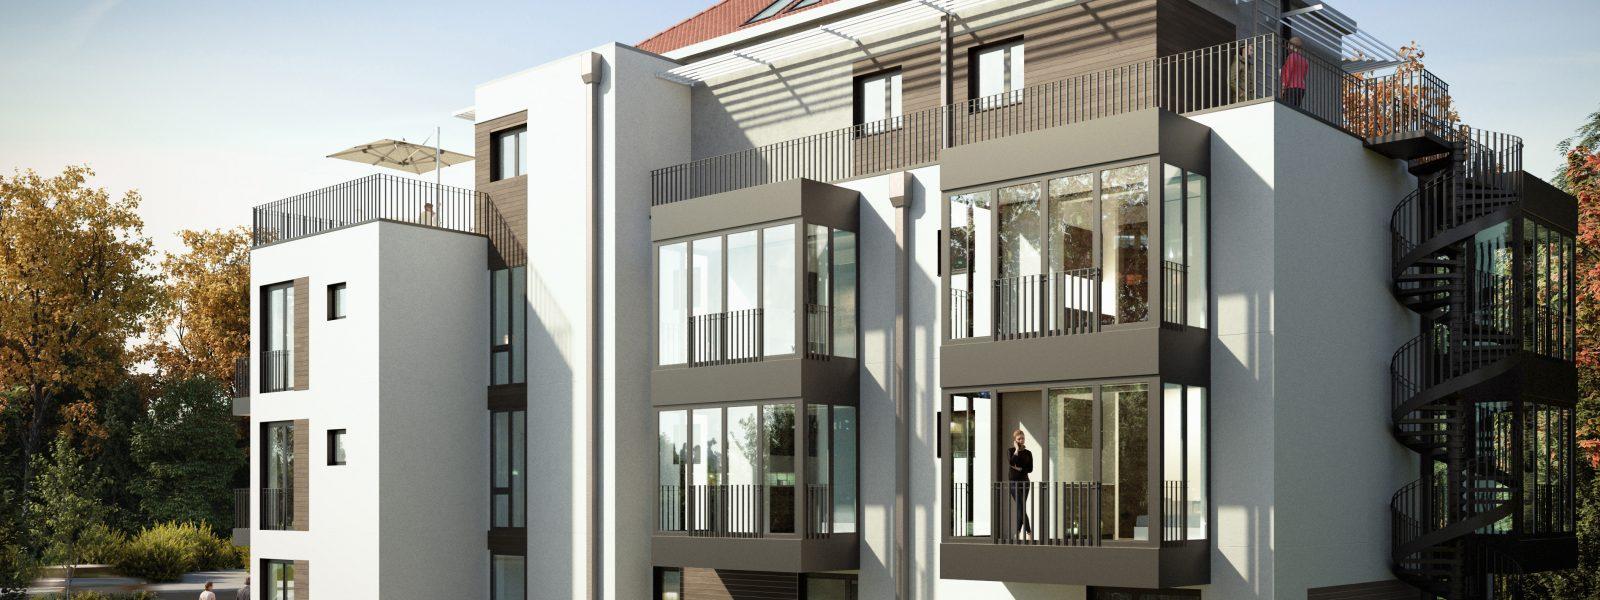 Luise11 – Brand new studio in prime Berlin location